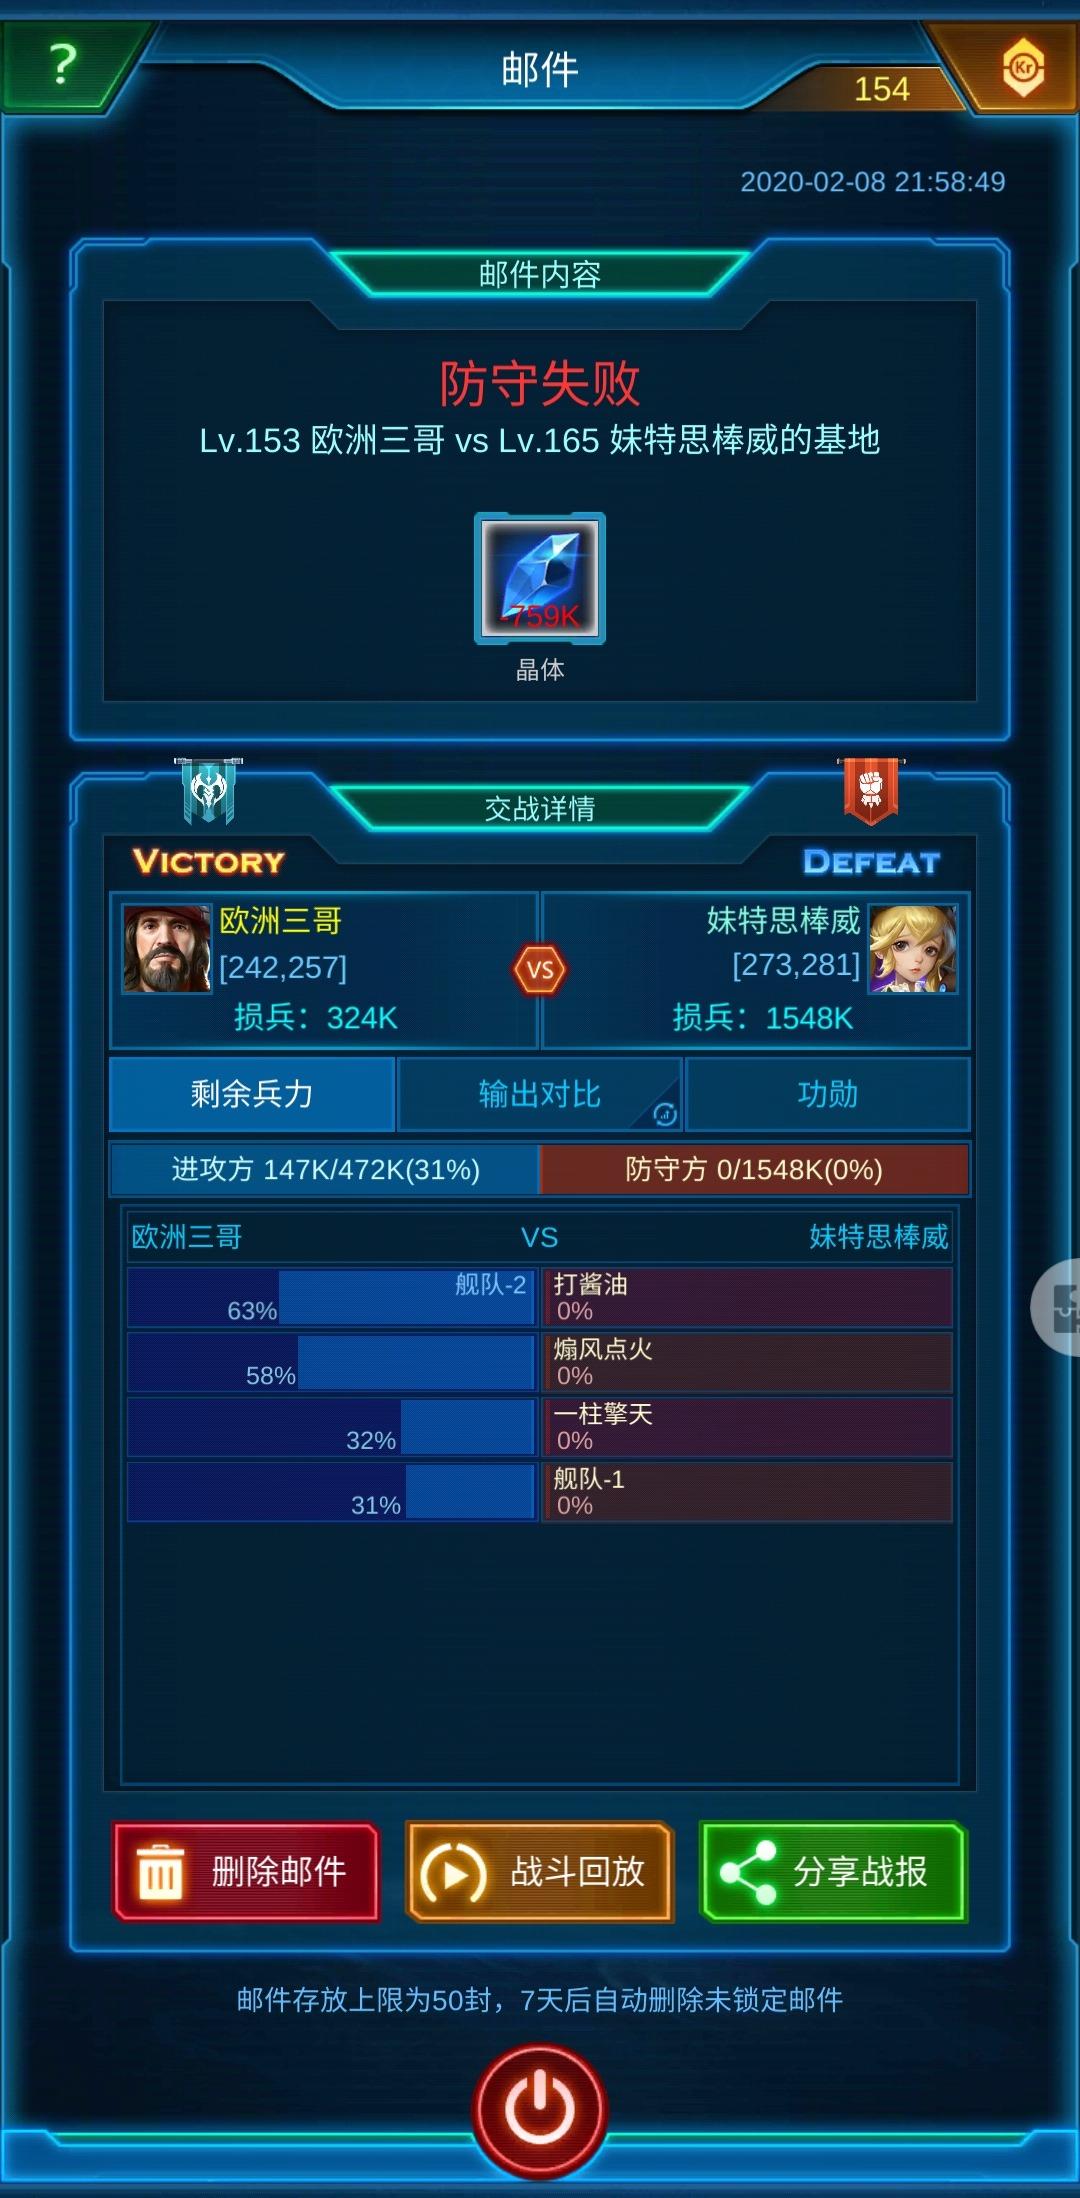 Screenshot_2020-02-08-23-19-47-184_com.jedigames.p16s.huawei.jpg